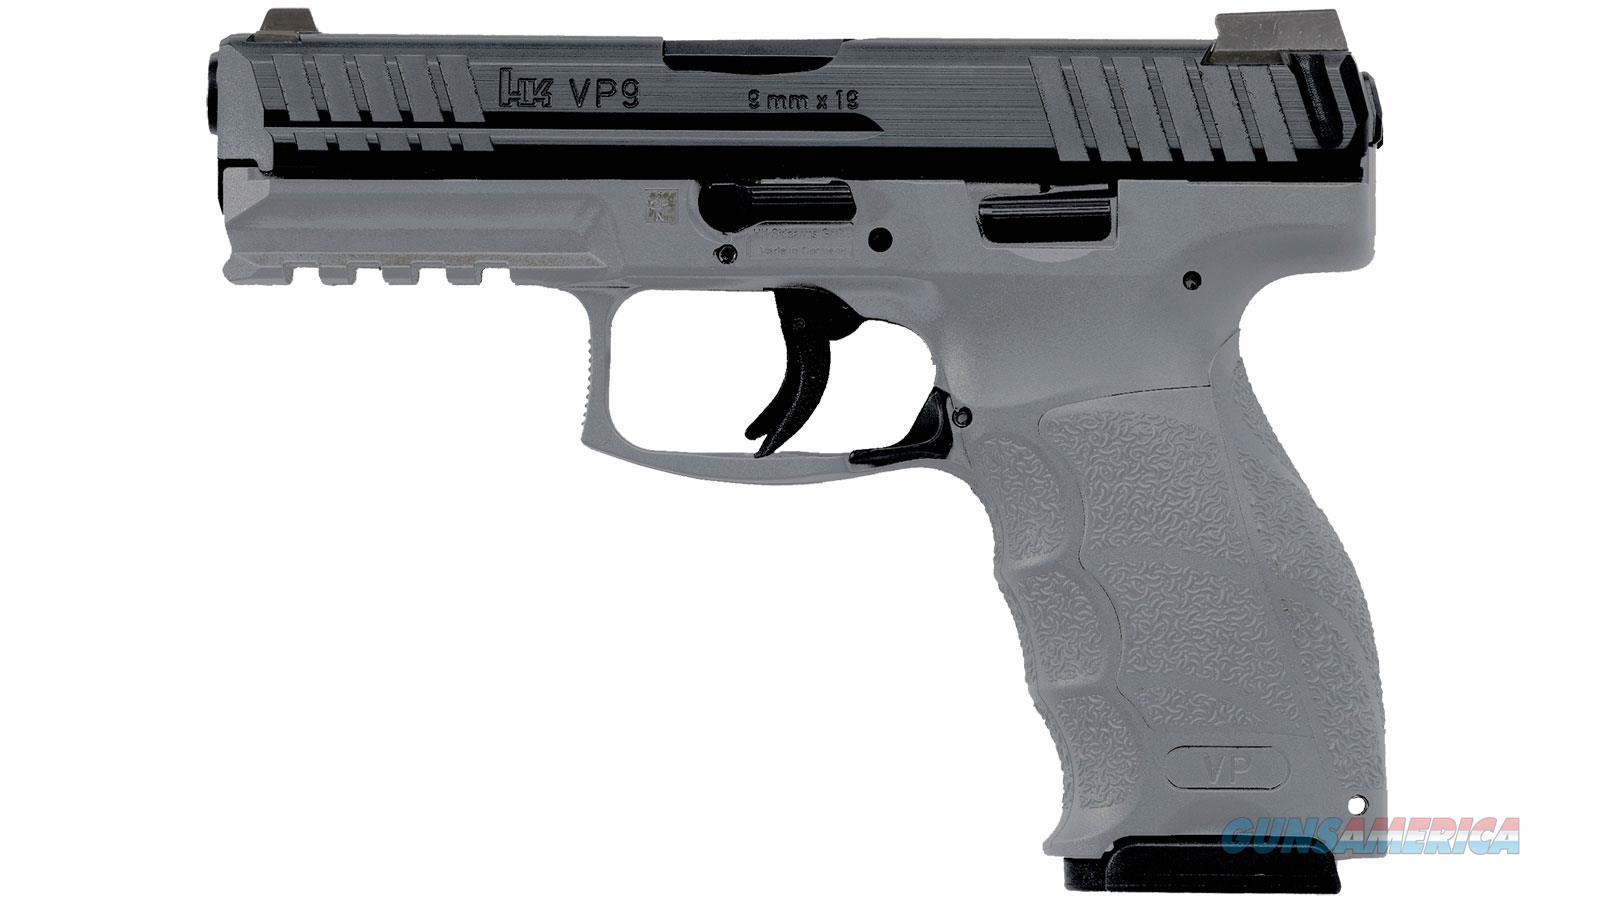 "Heckler & Koch Vp9 Gry Frame Le 9Mm 4.1"" 700009GYLEA5  Guns > Pistols > H Misc Pistols"